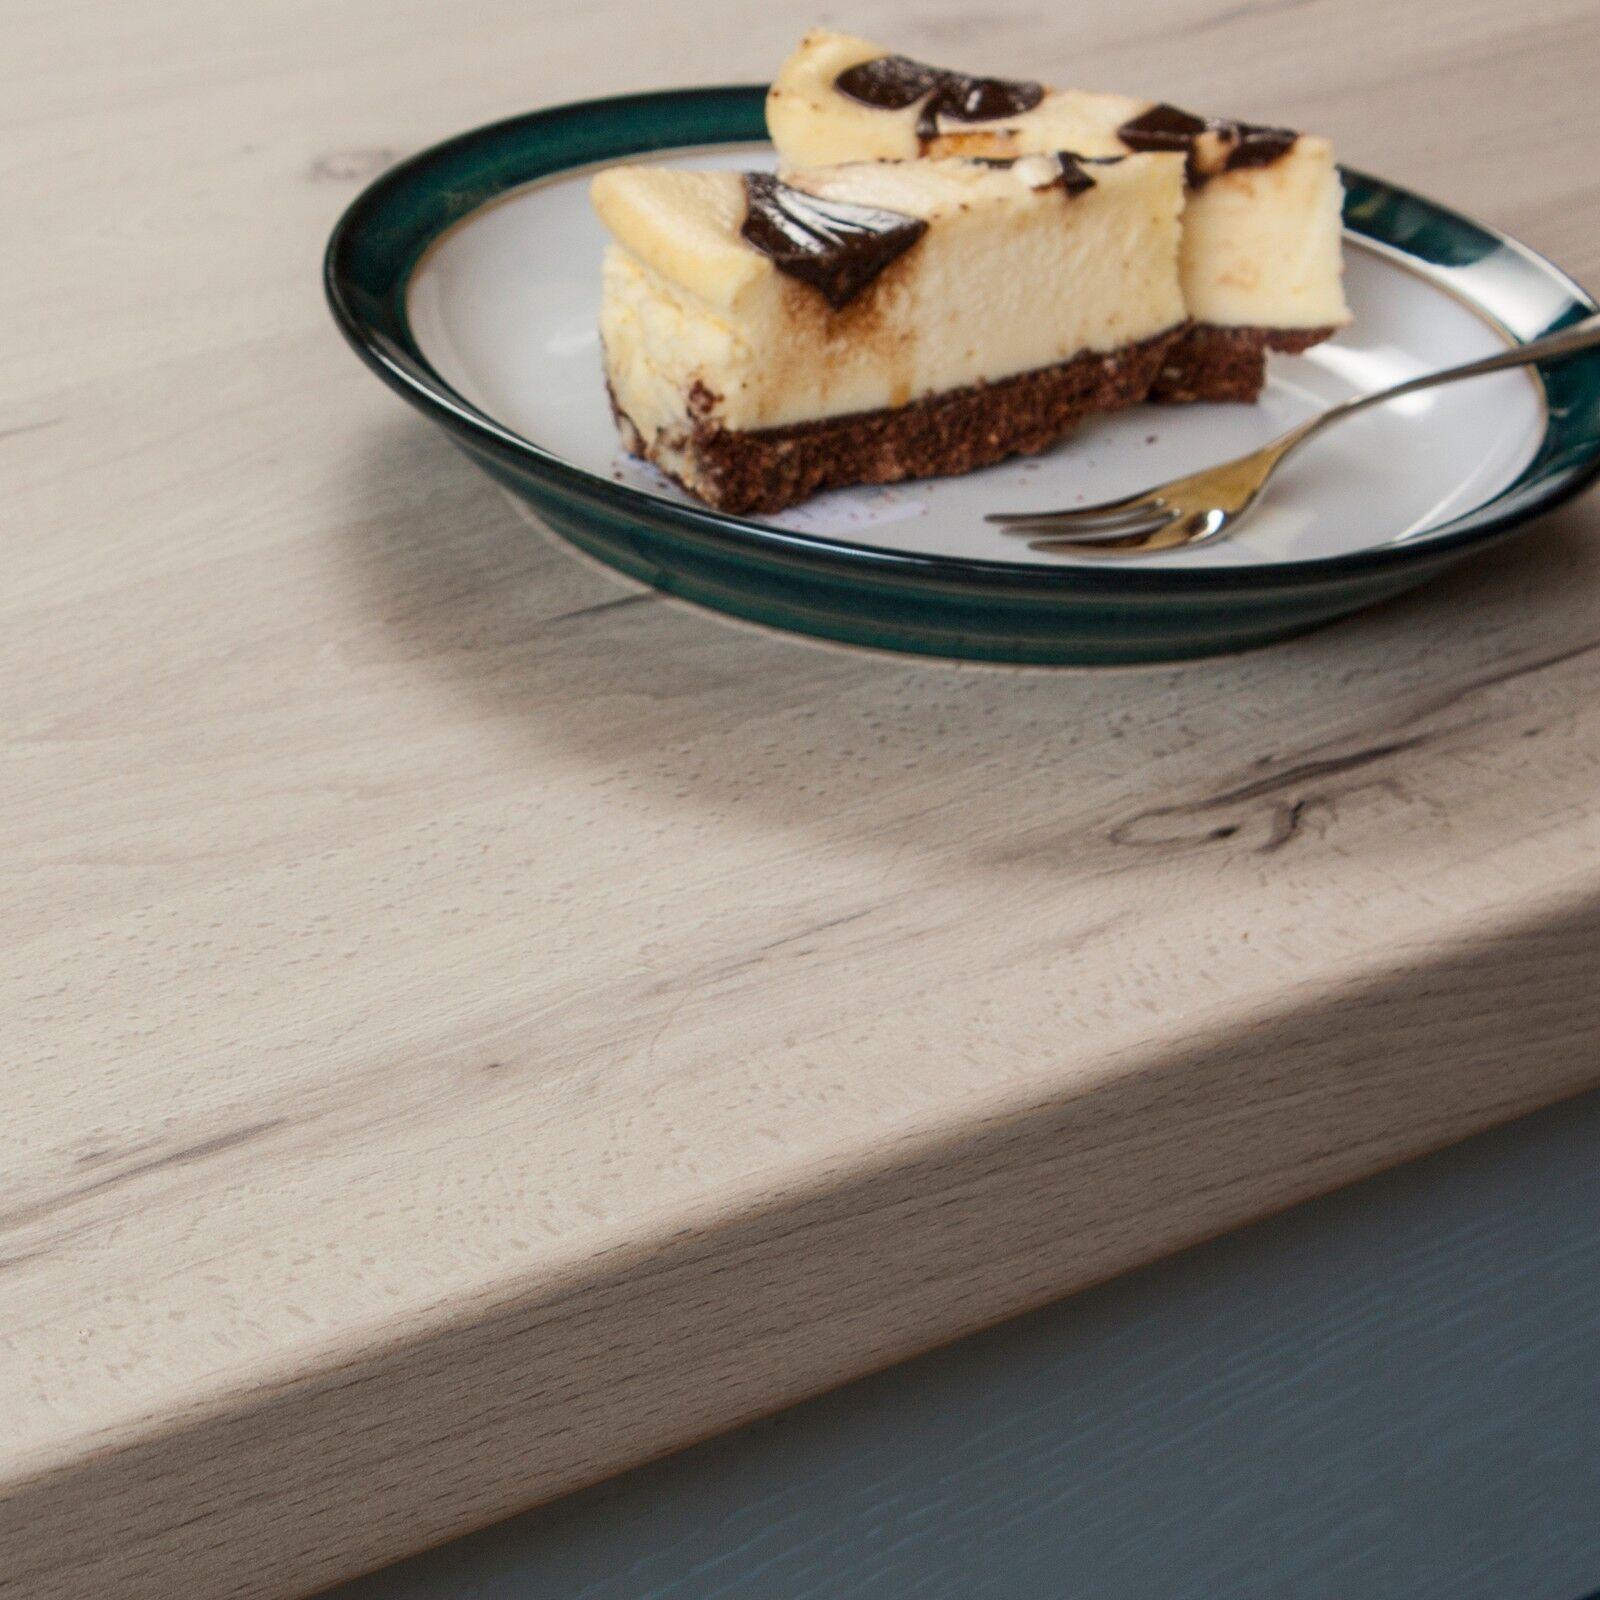 Helles Holz Arbeitsplatte 3000mm × × × 600mm × 38mm Resopal Küchenarbeitsplatten a32c20